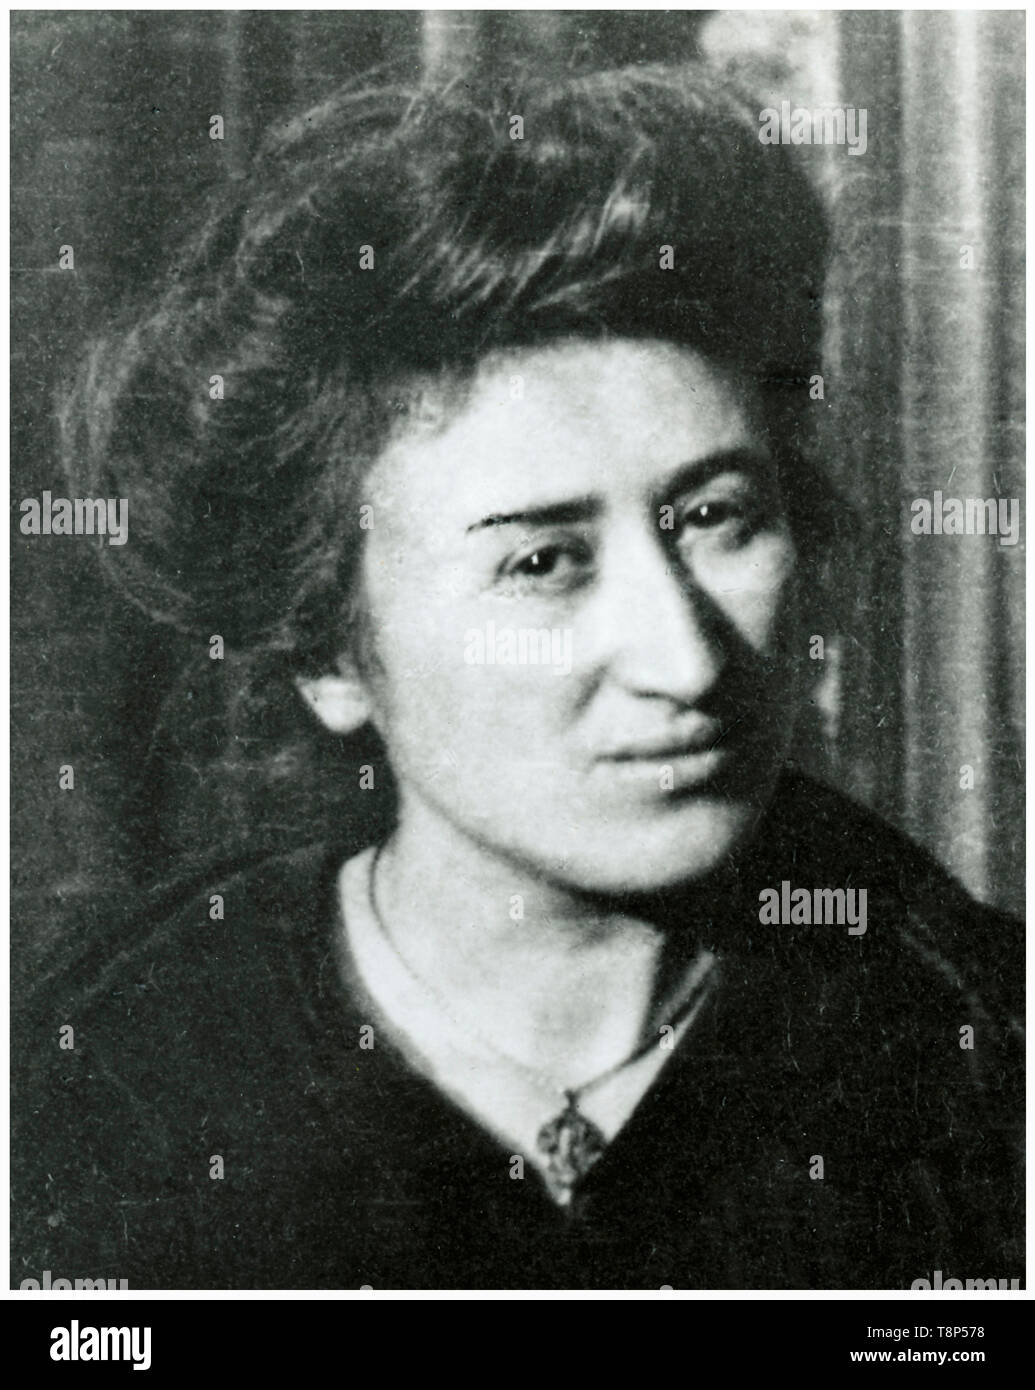 Rosa Luxembourg, portrait photograph, 1910 - Stock Image